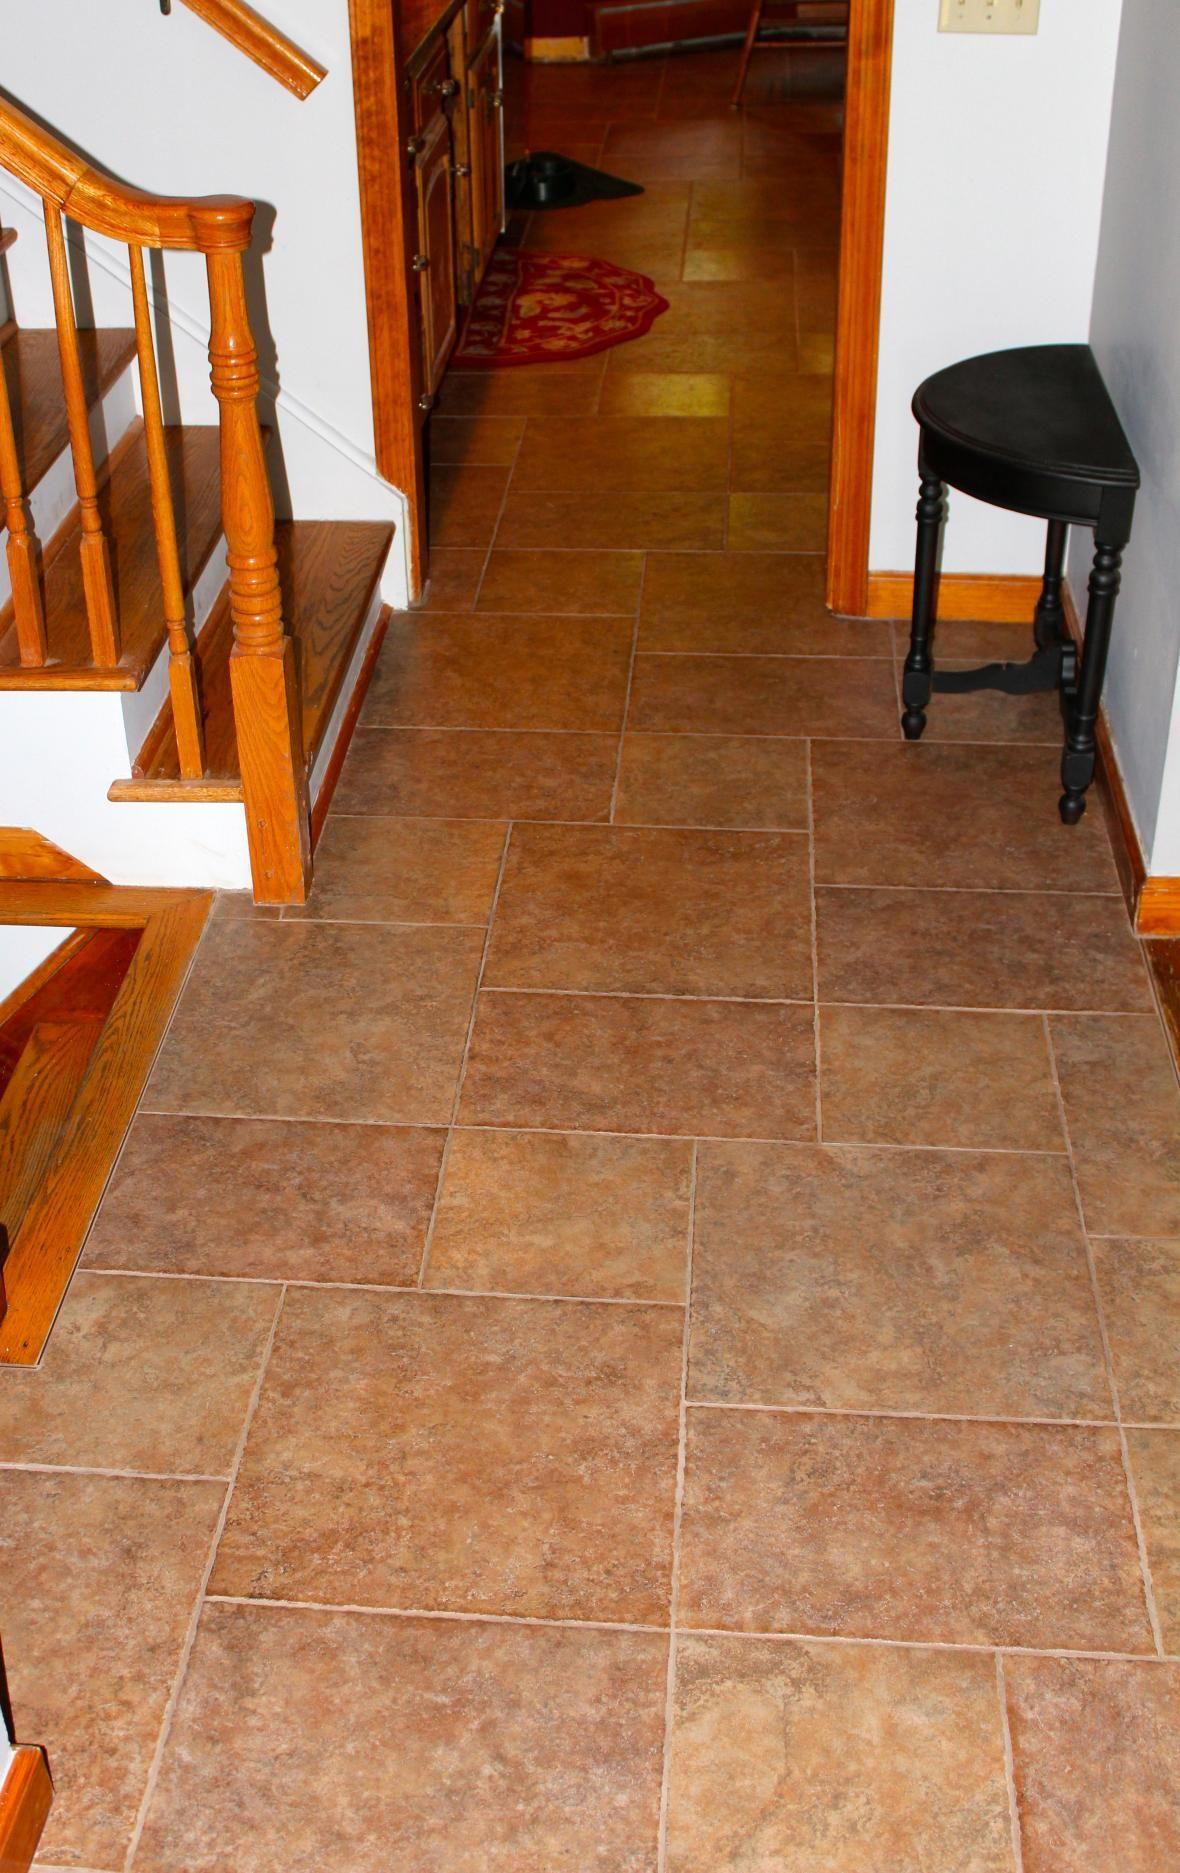 Kitchen Floor Tile About Kitchen Floor Porcelain Tile Foyer And Kitchen Tile Floor Kitchen Flooring Kitchen Tiles Design Kitchen Floor Tile